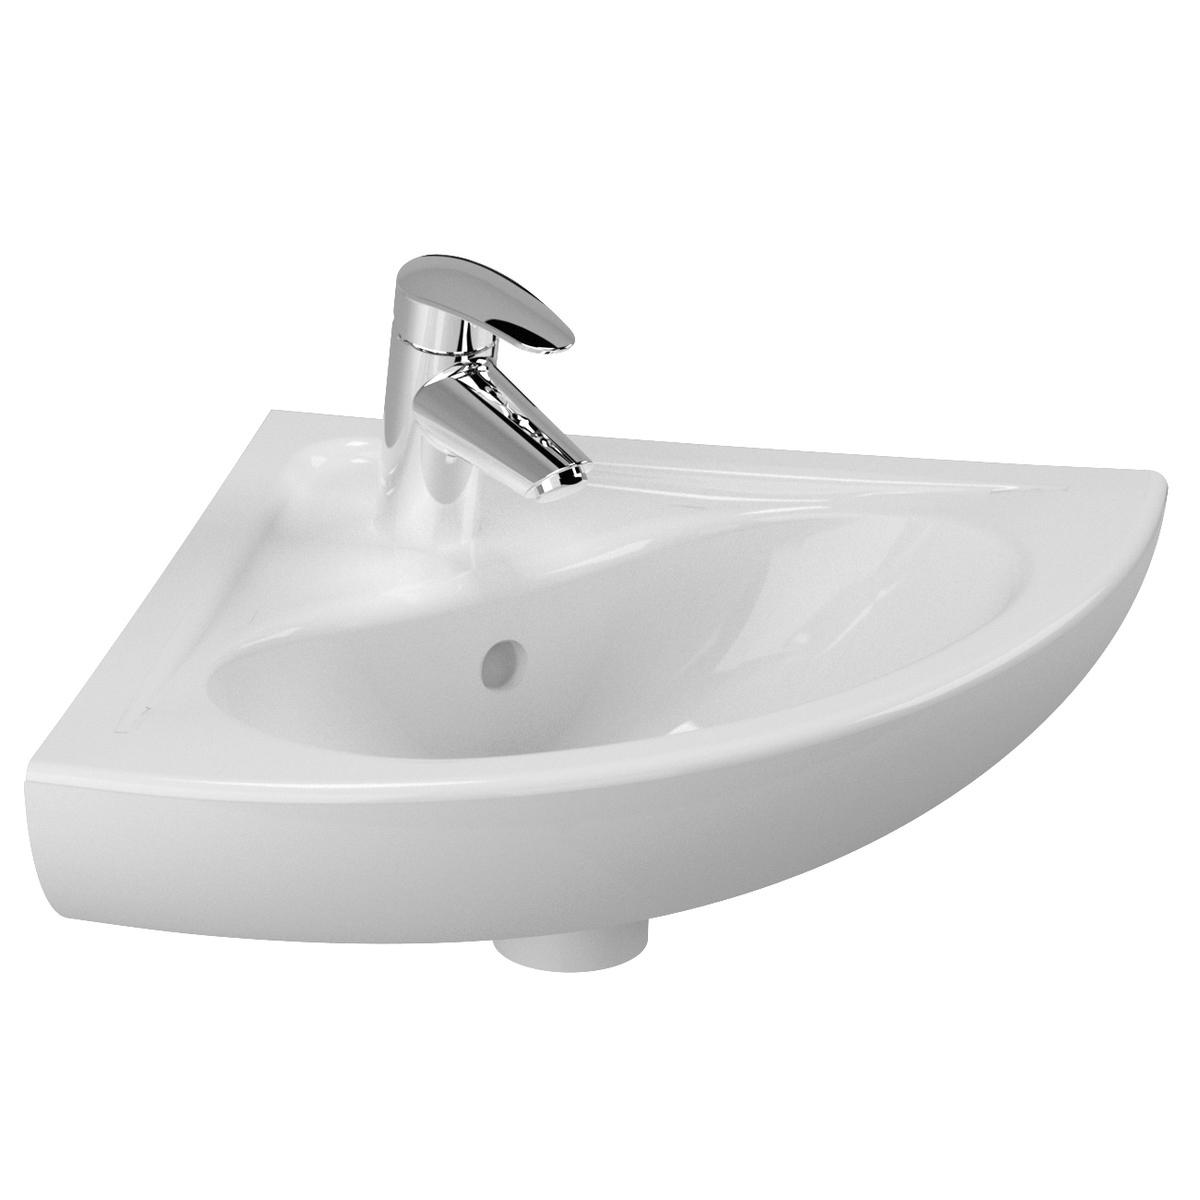 Lave-mains d'angle Savo Aquance